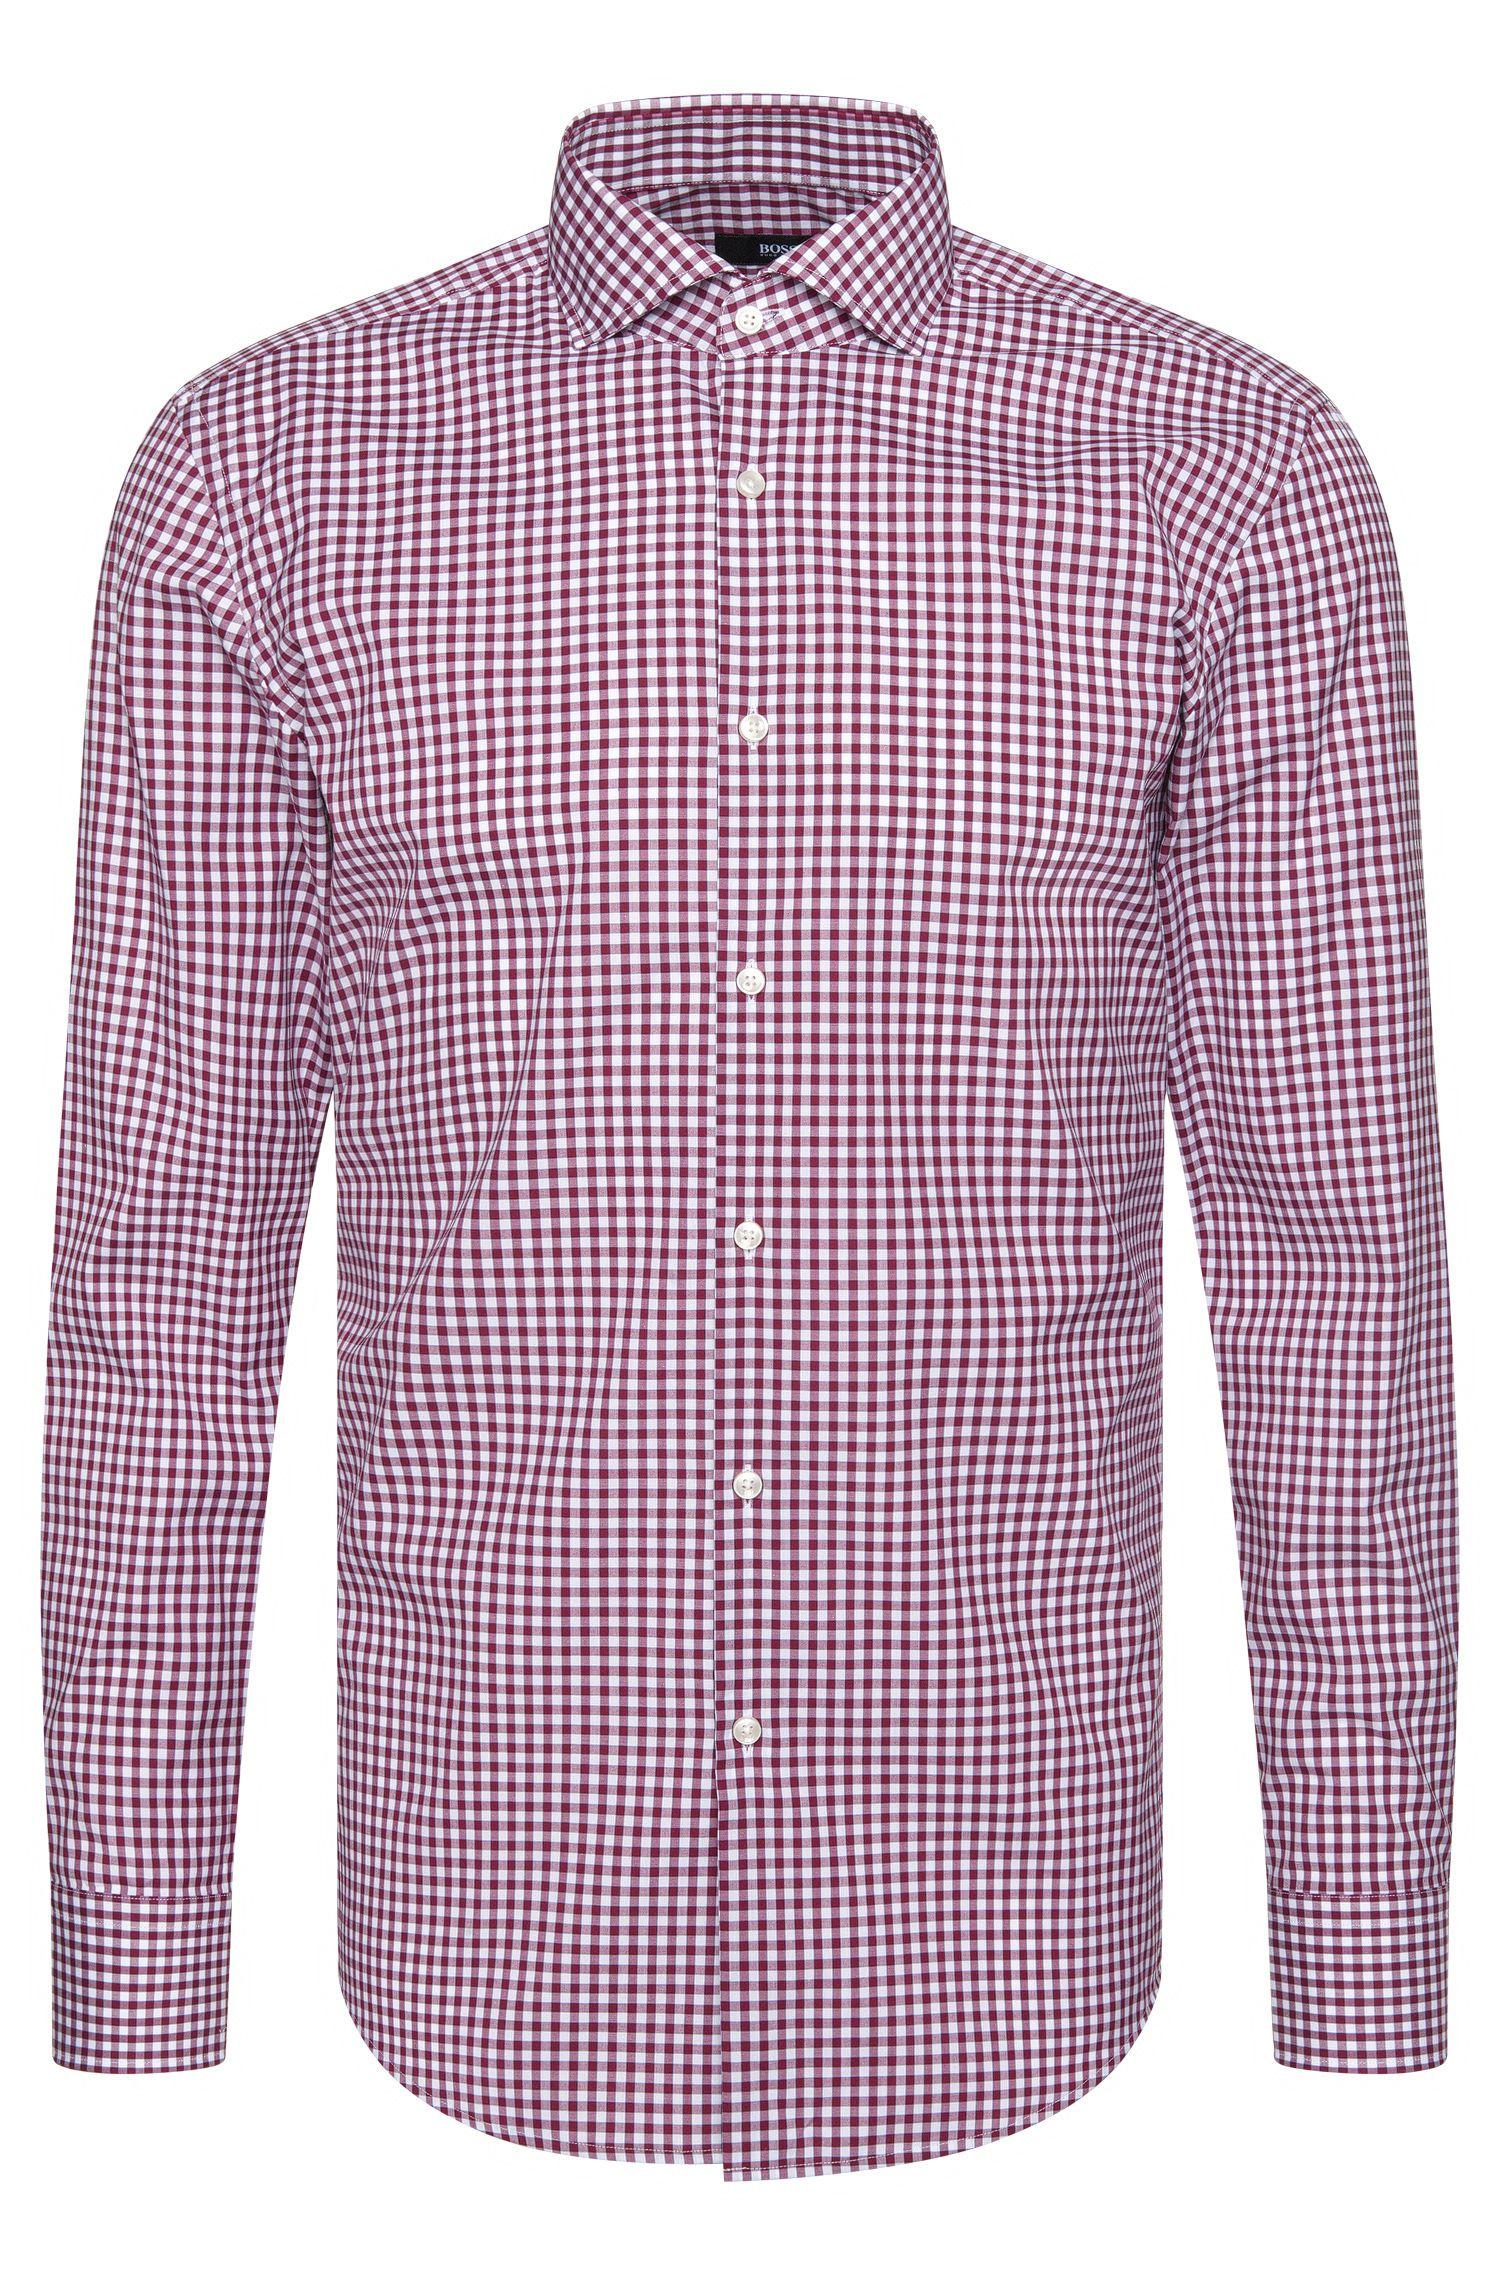 Gingham Cotton Dress Shirt, Slim Fit | Jason